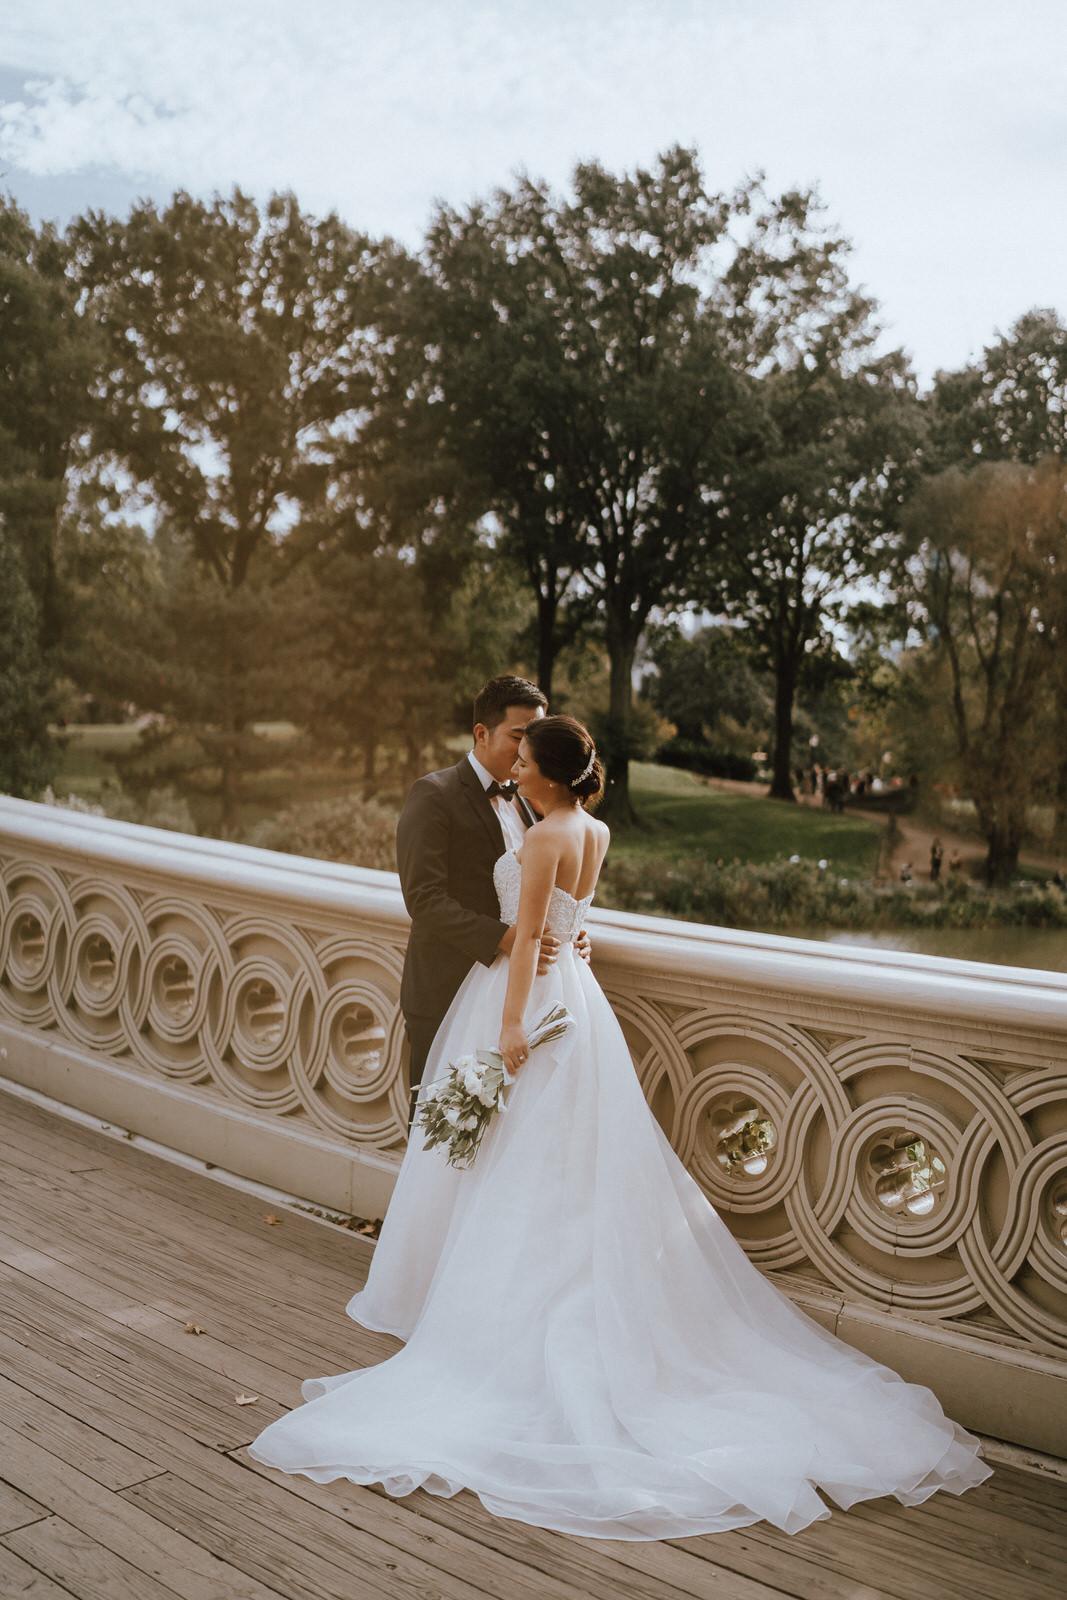 Central Park Elopement Photos-Bow Bridge-Michelle Gonzalez Photography- New York Wedding Photographer-21.jpg